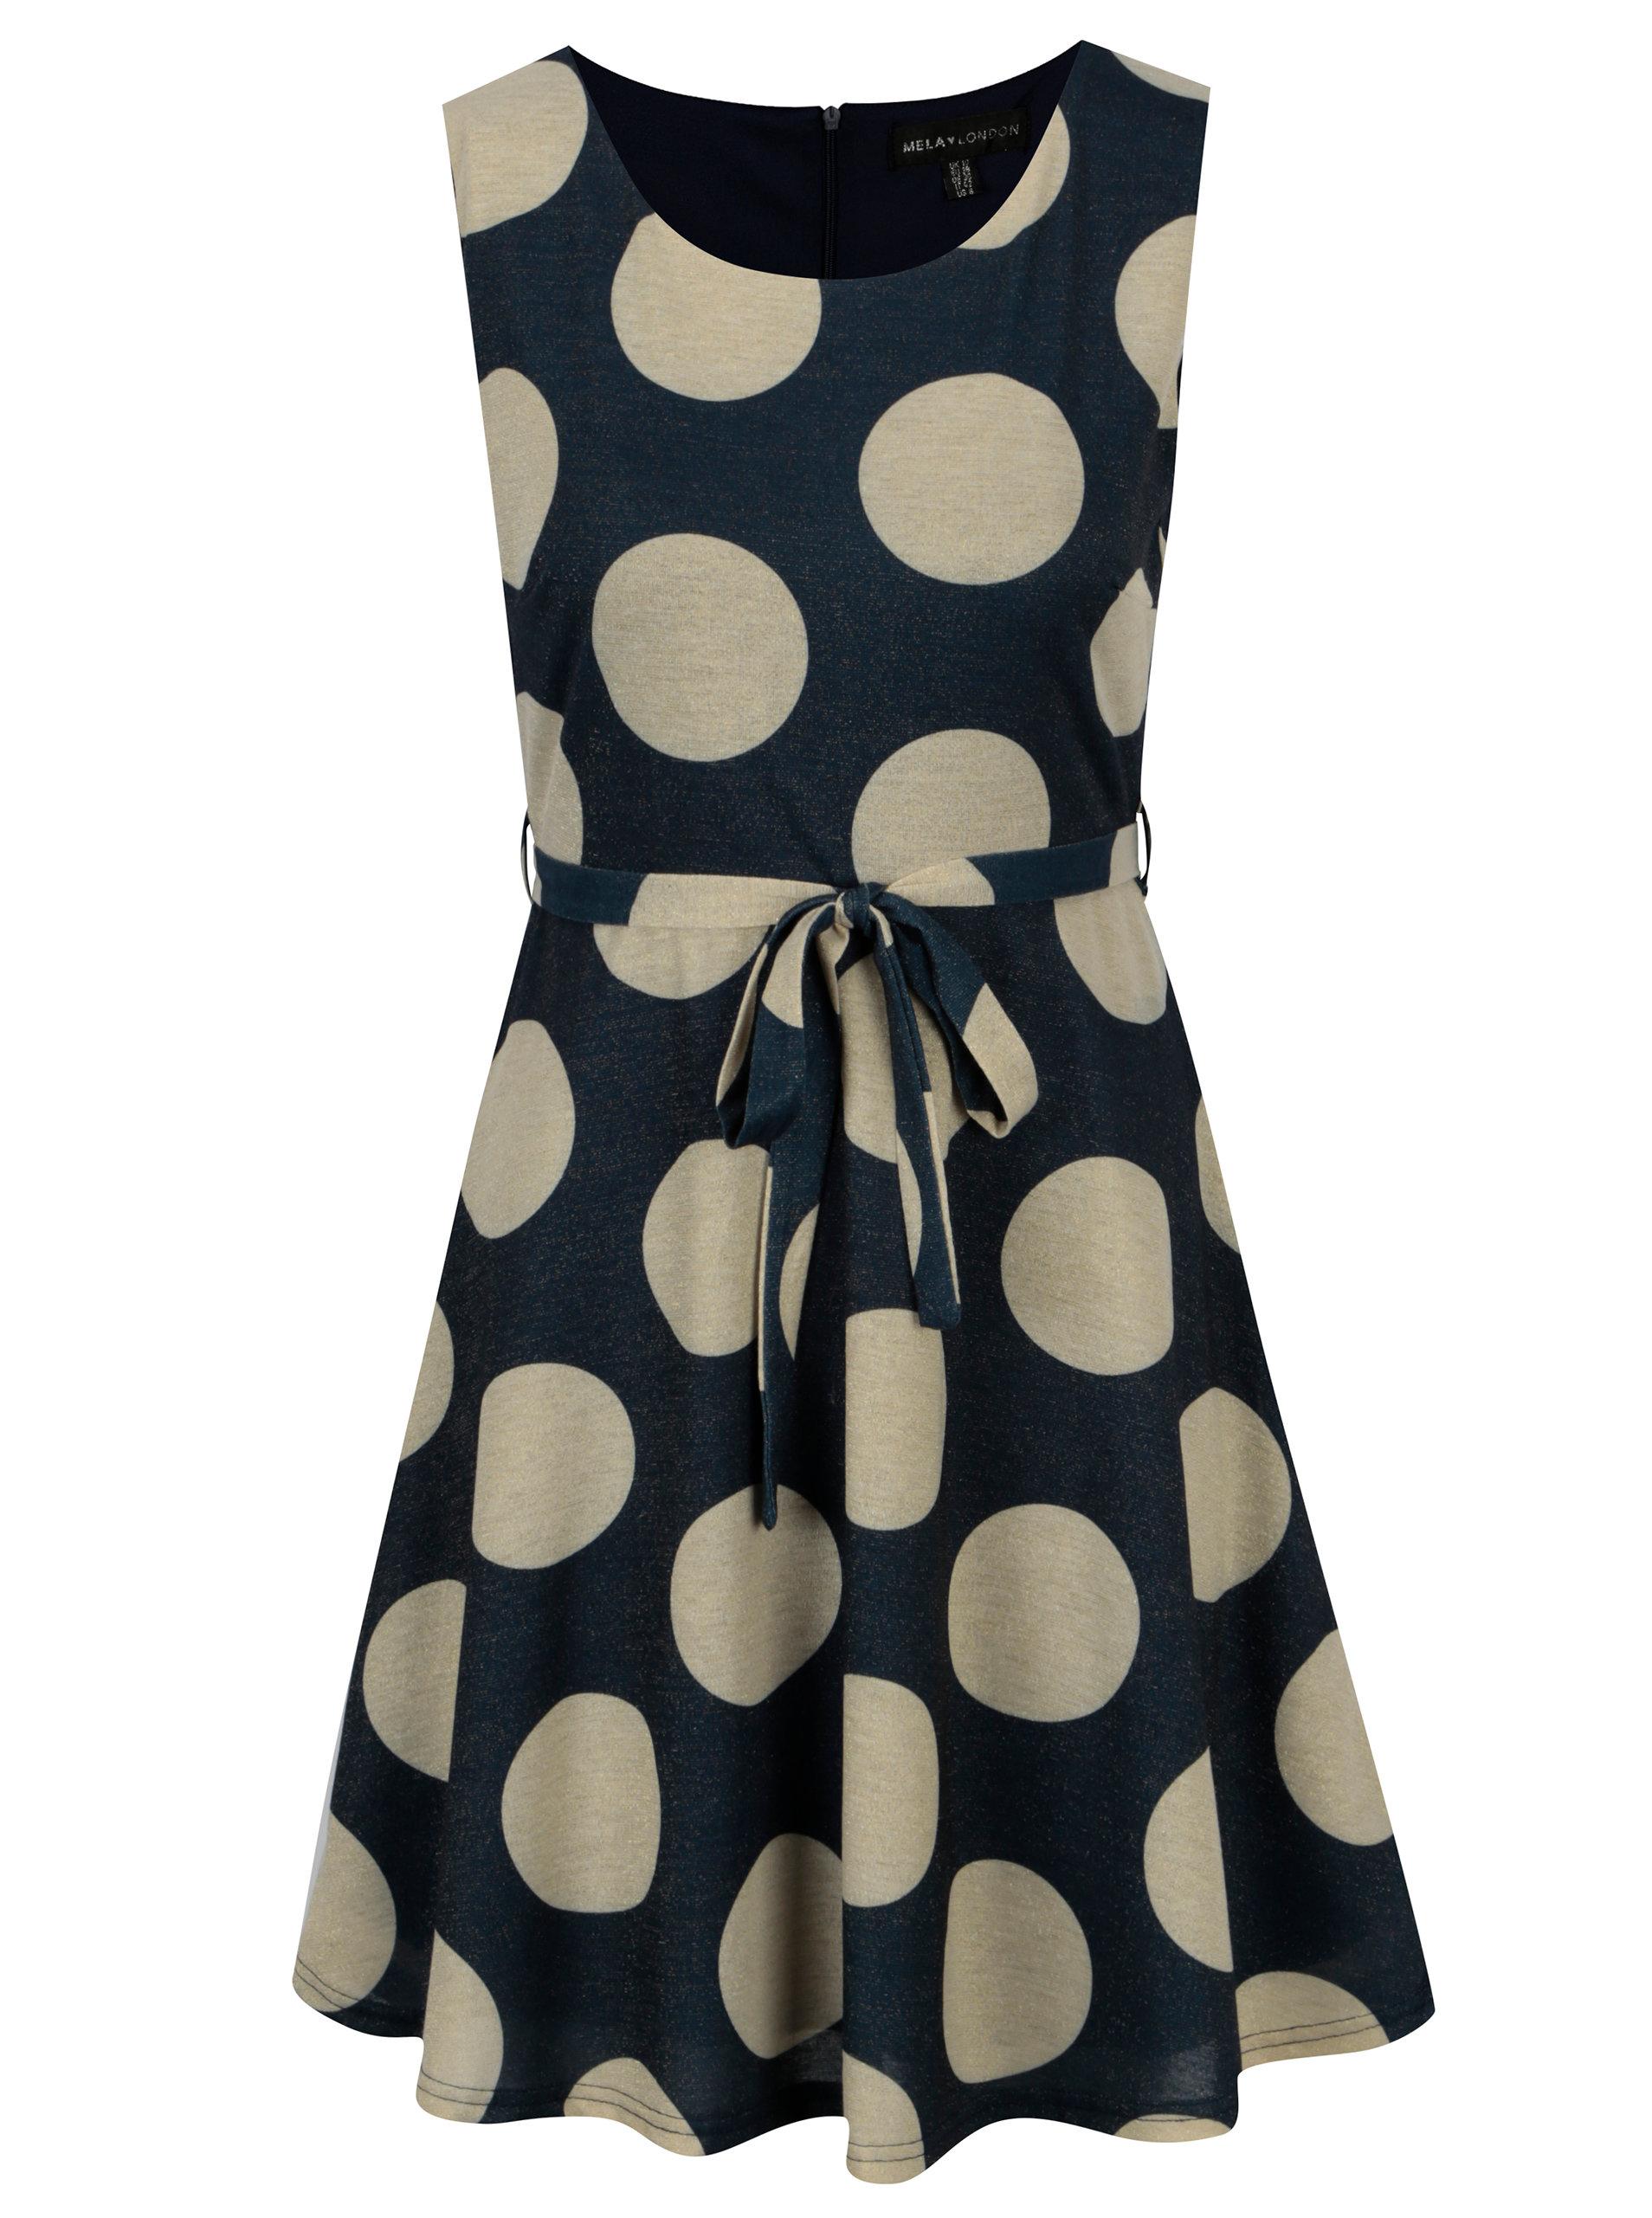 d6e6c4d15d2a Zlato-modré šaty s puntíky a páskem Mela London ...